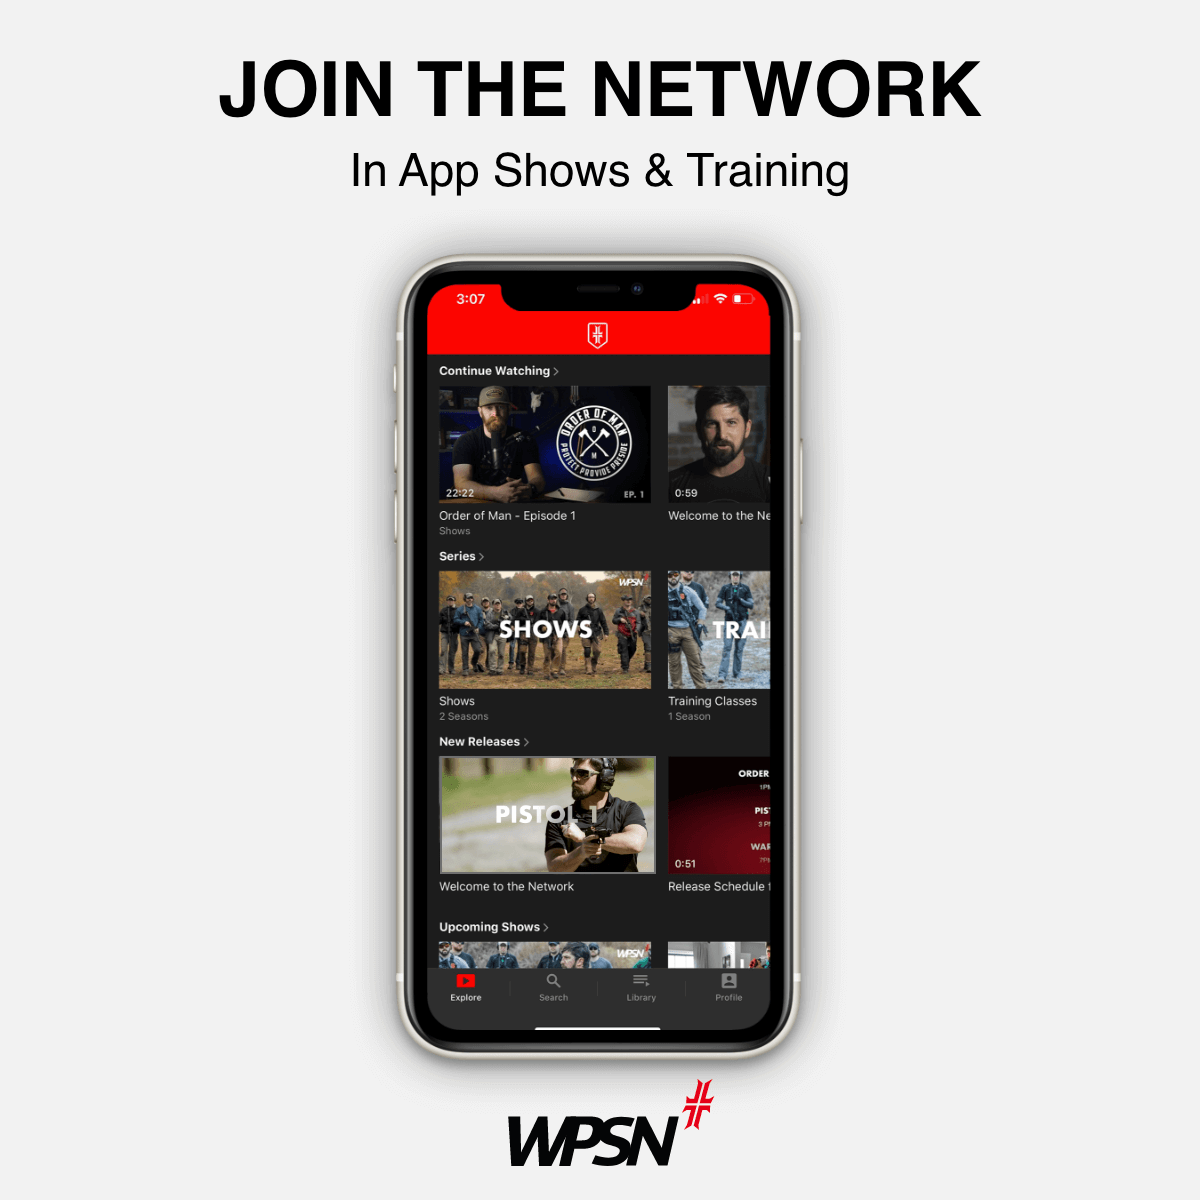 WPS Network